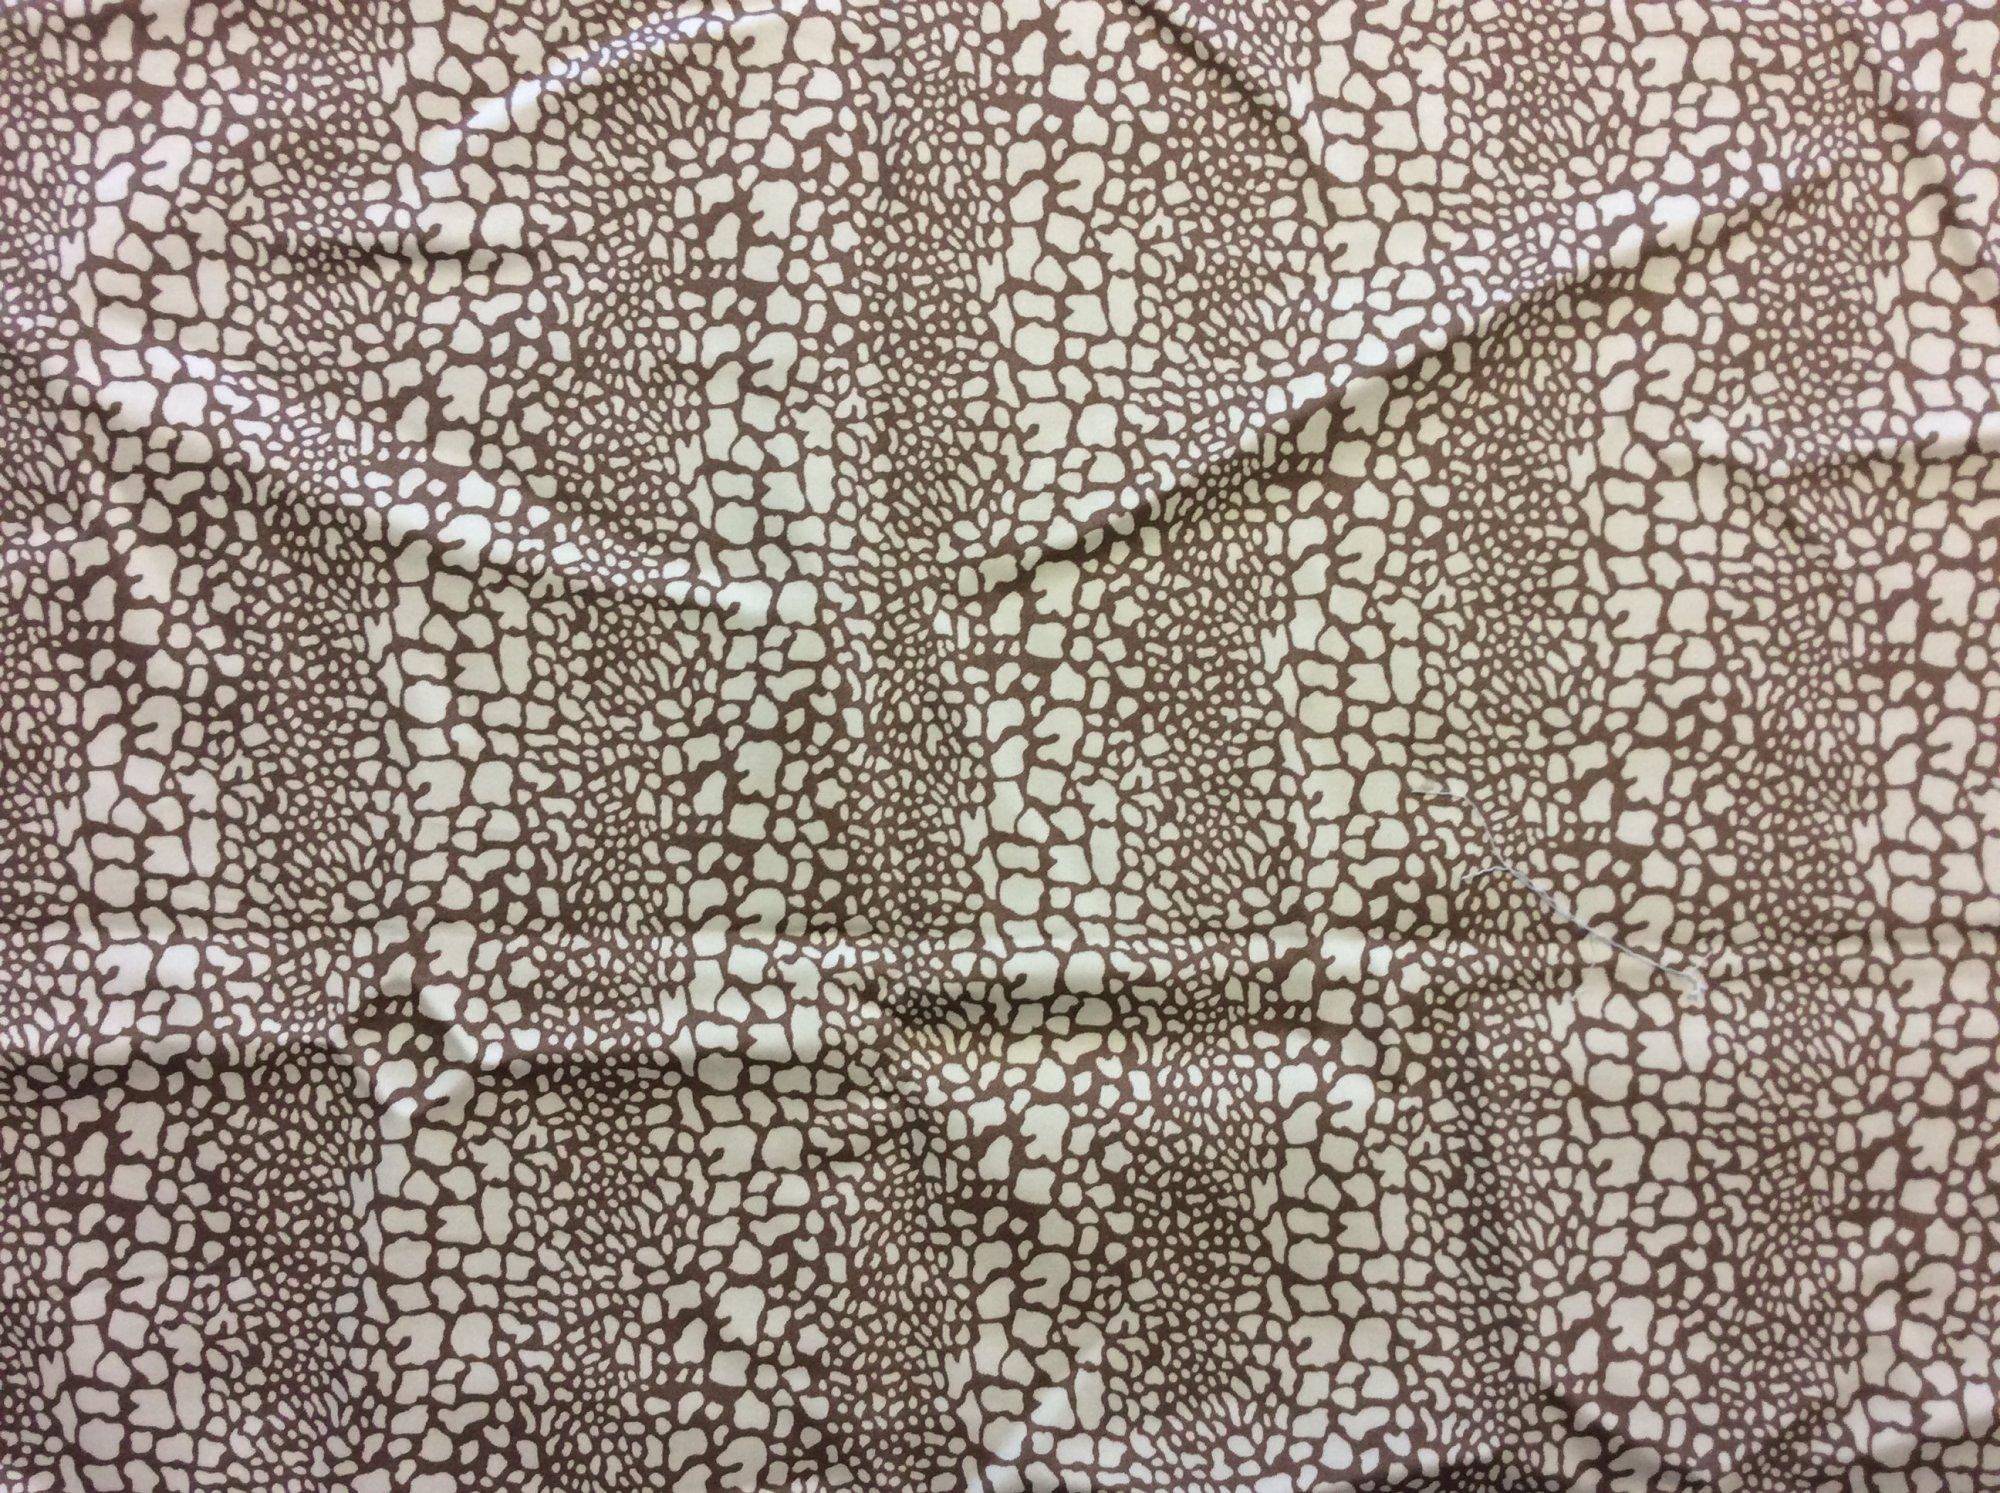 Last Piece! 1.5 Yard Piece! Vicki Payne Free Spirit Giraffe Stripe Canvas Twill Animal Print Home Decor Upholstery Fabric REM019